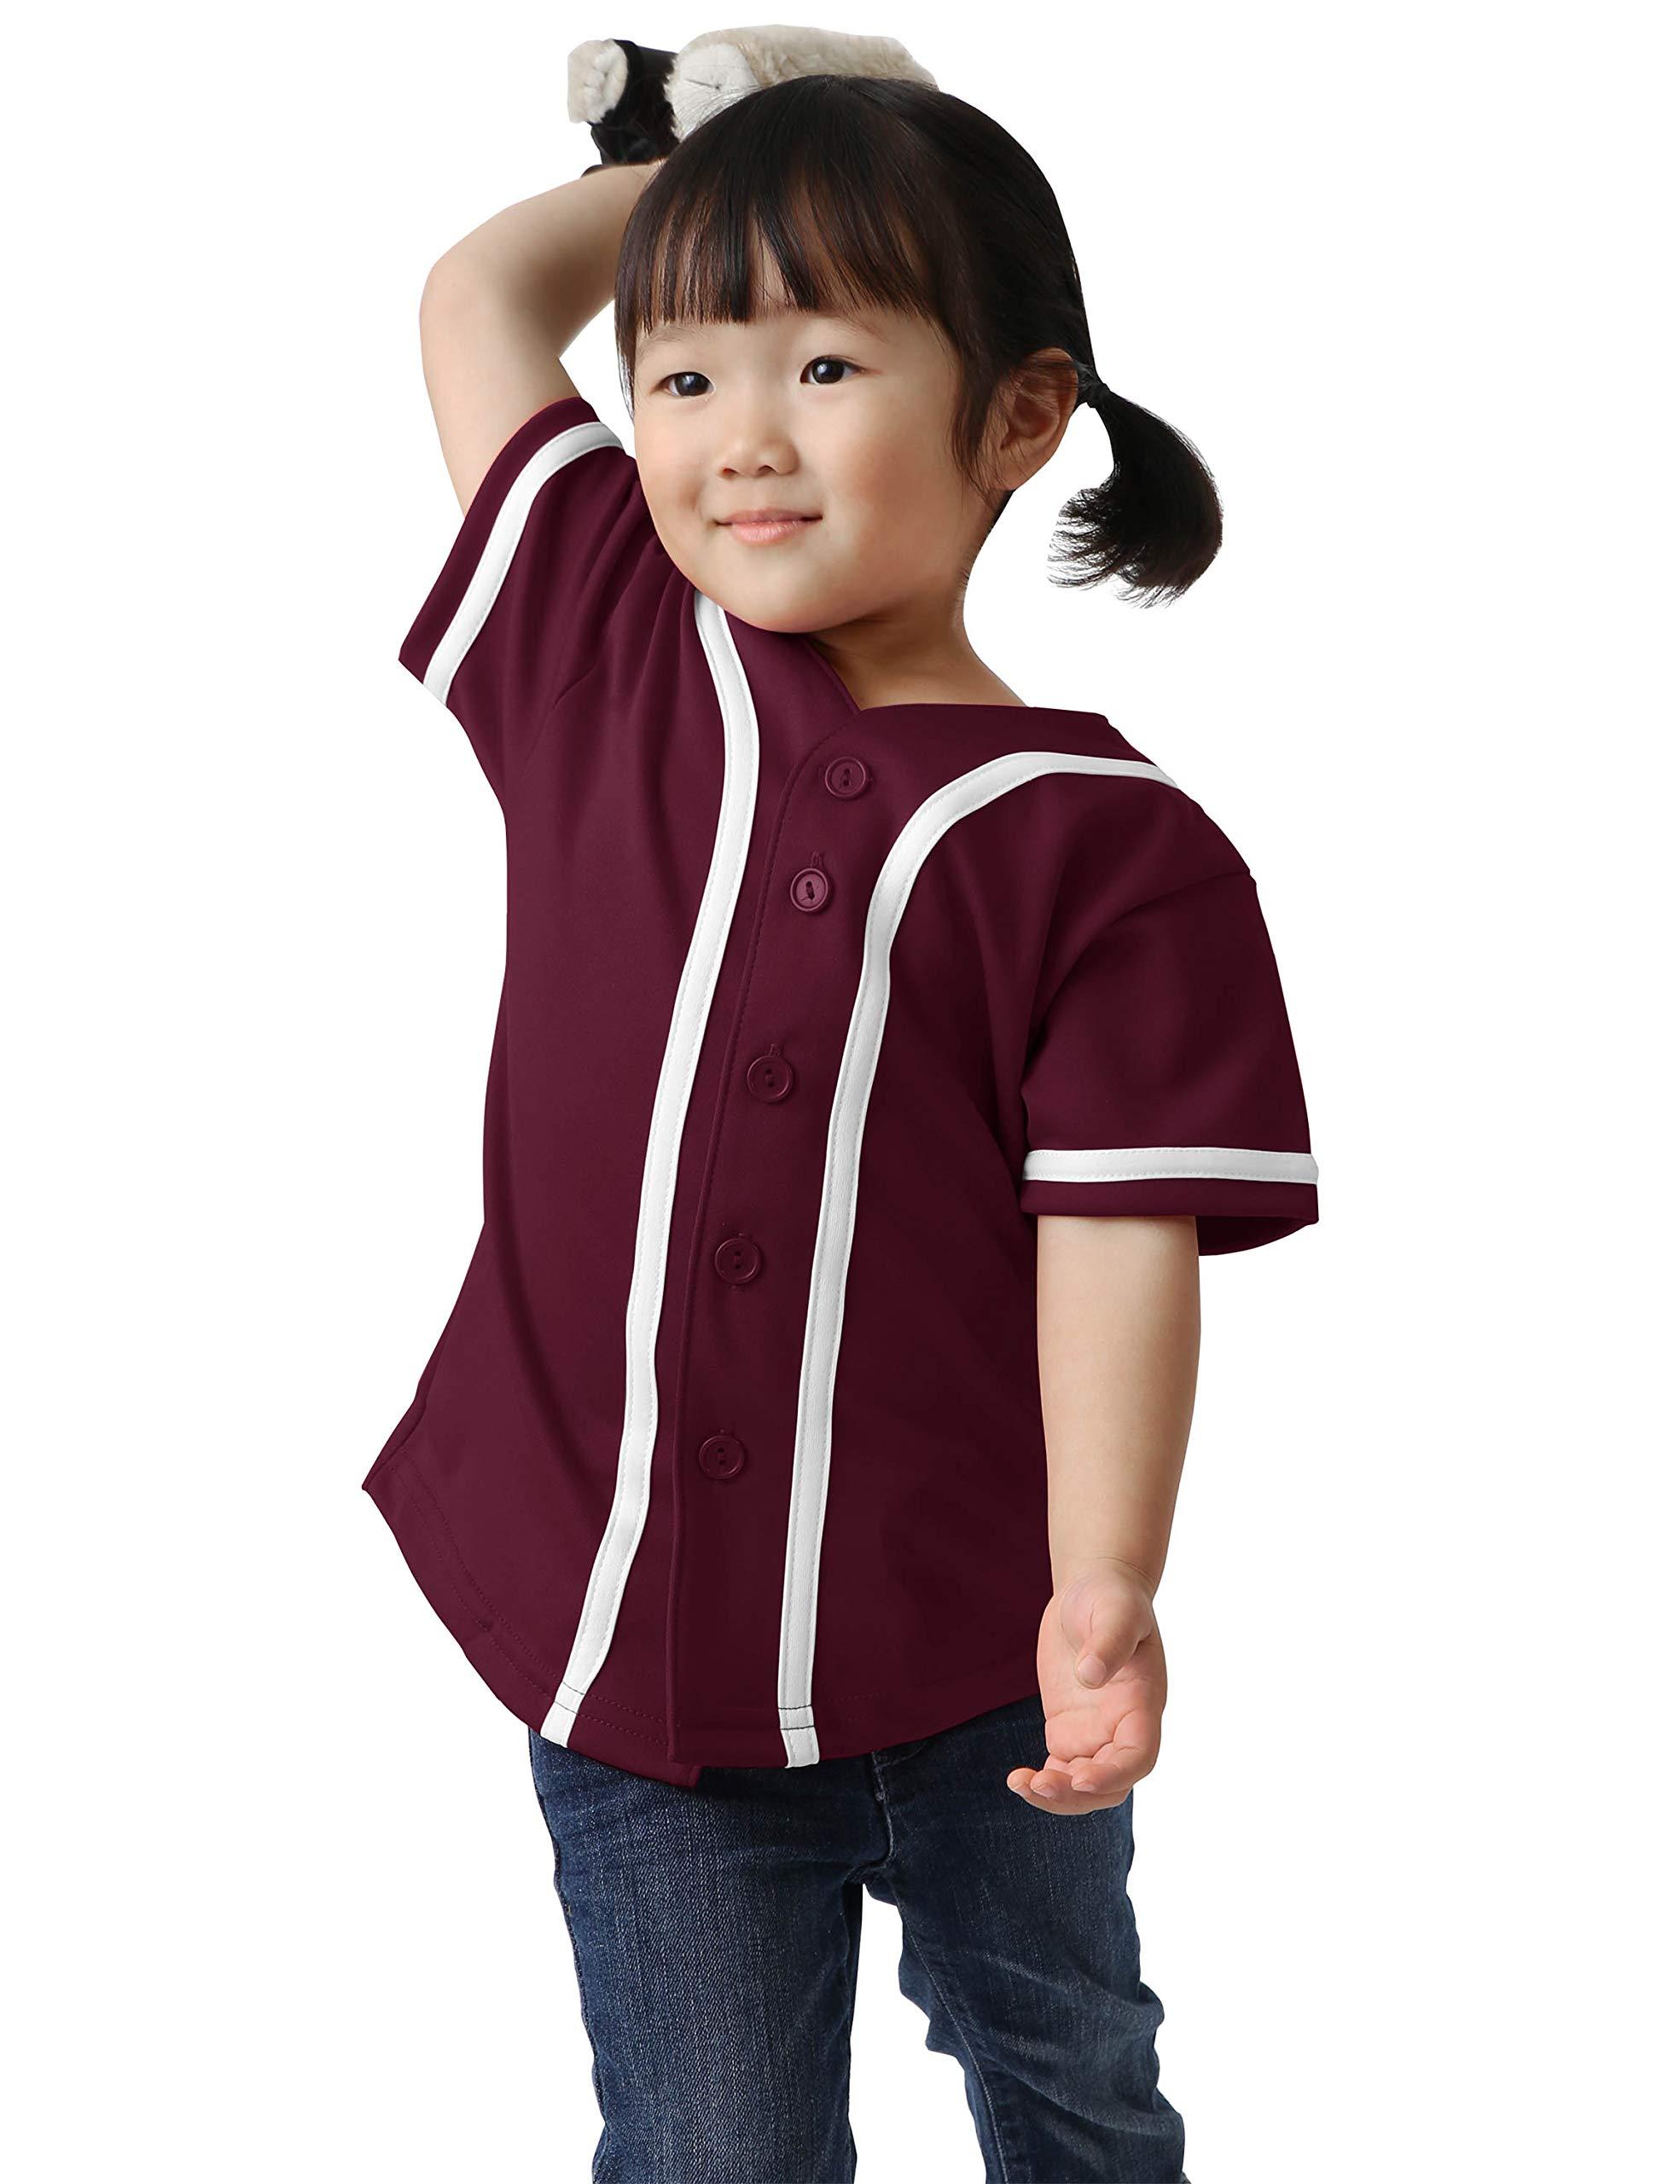 Ma Croix Kids Premium Baseball Jersey Active Button Shirt Team Uniform Little League (12 Month, 5up01_Bug.WHI) by Ma Croix